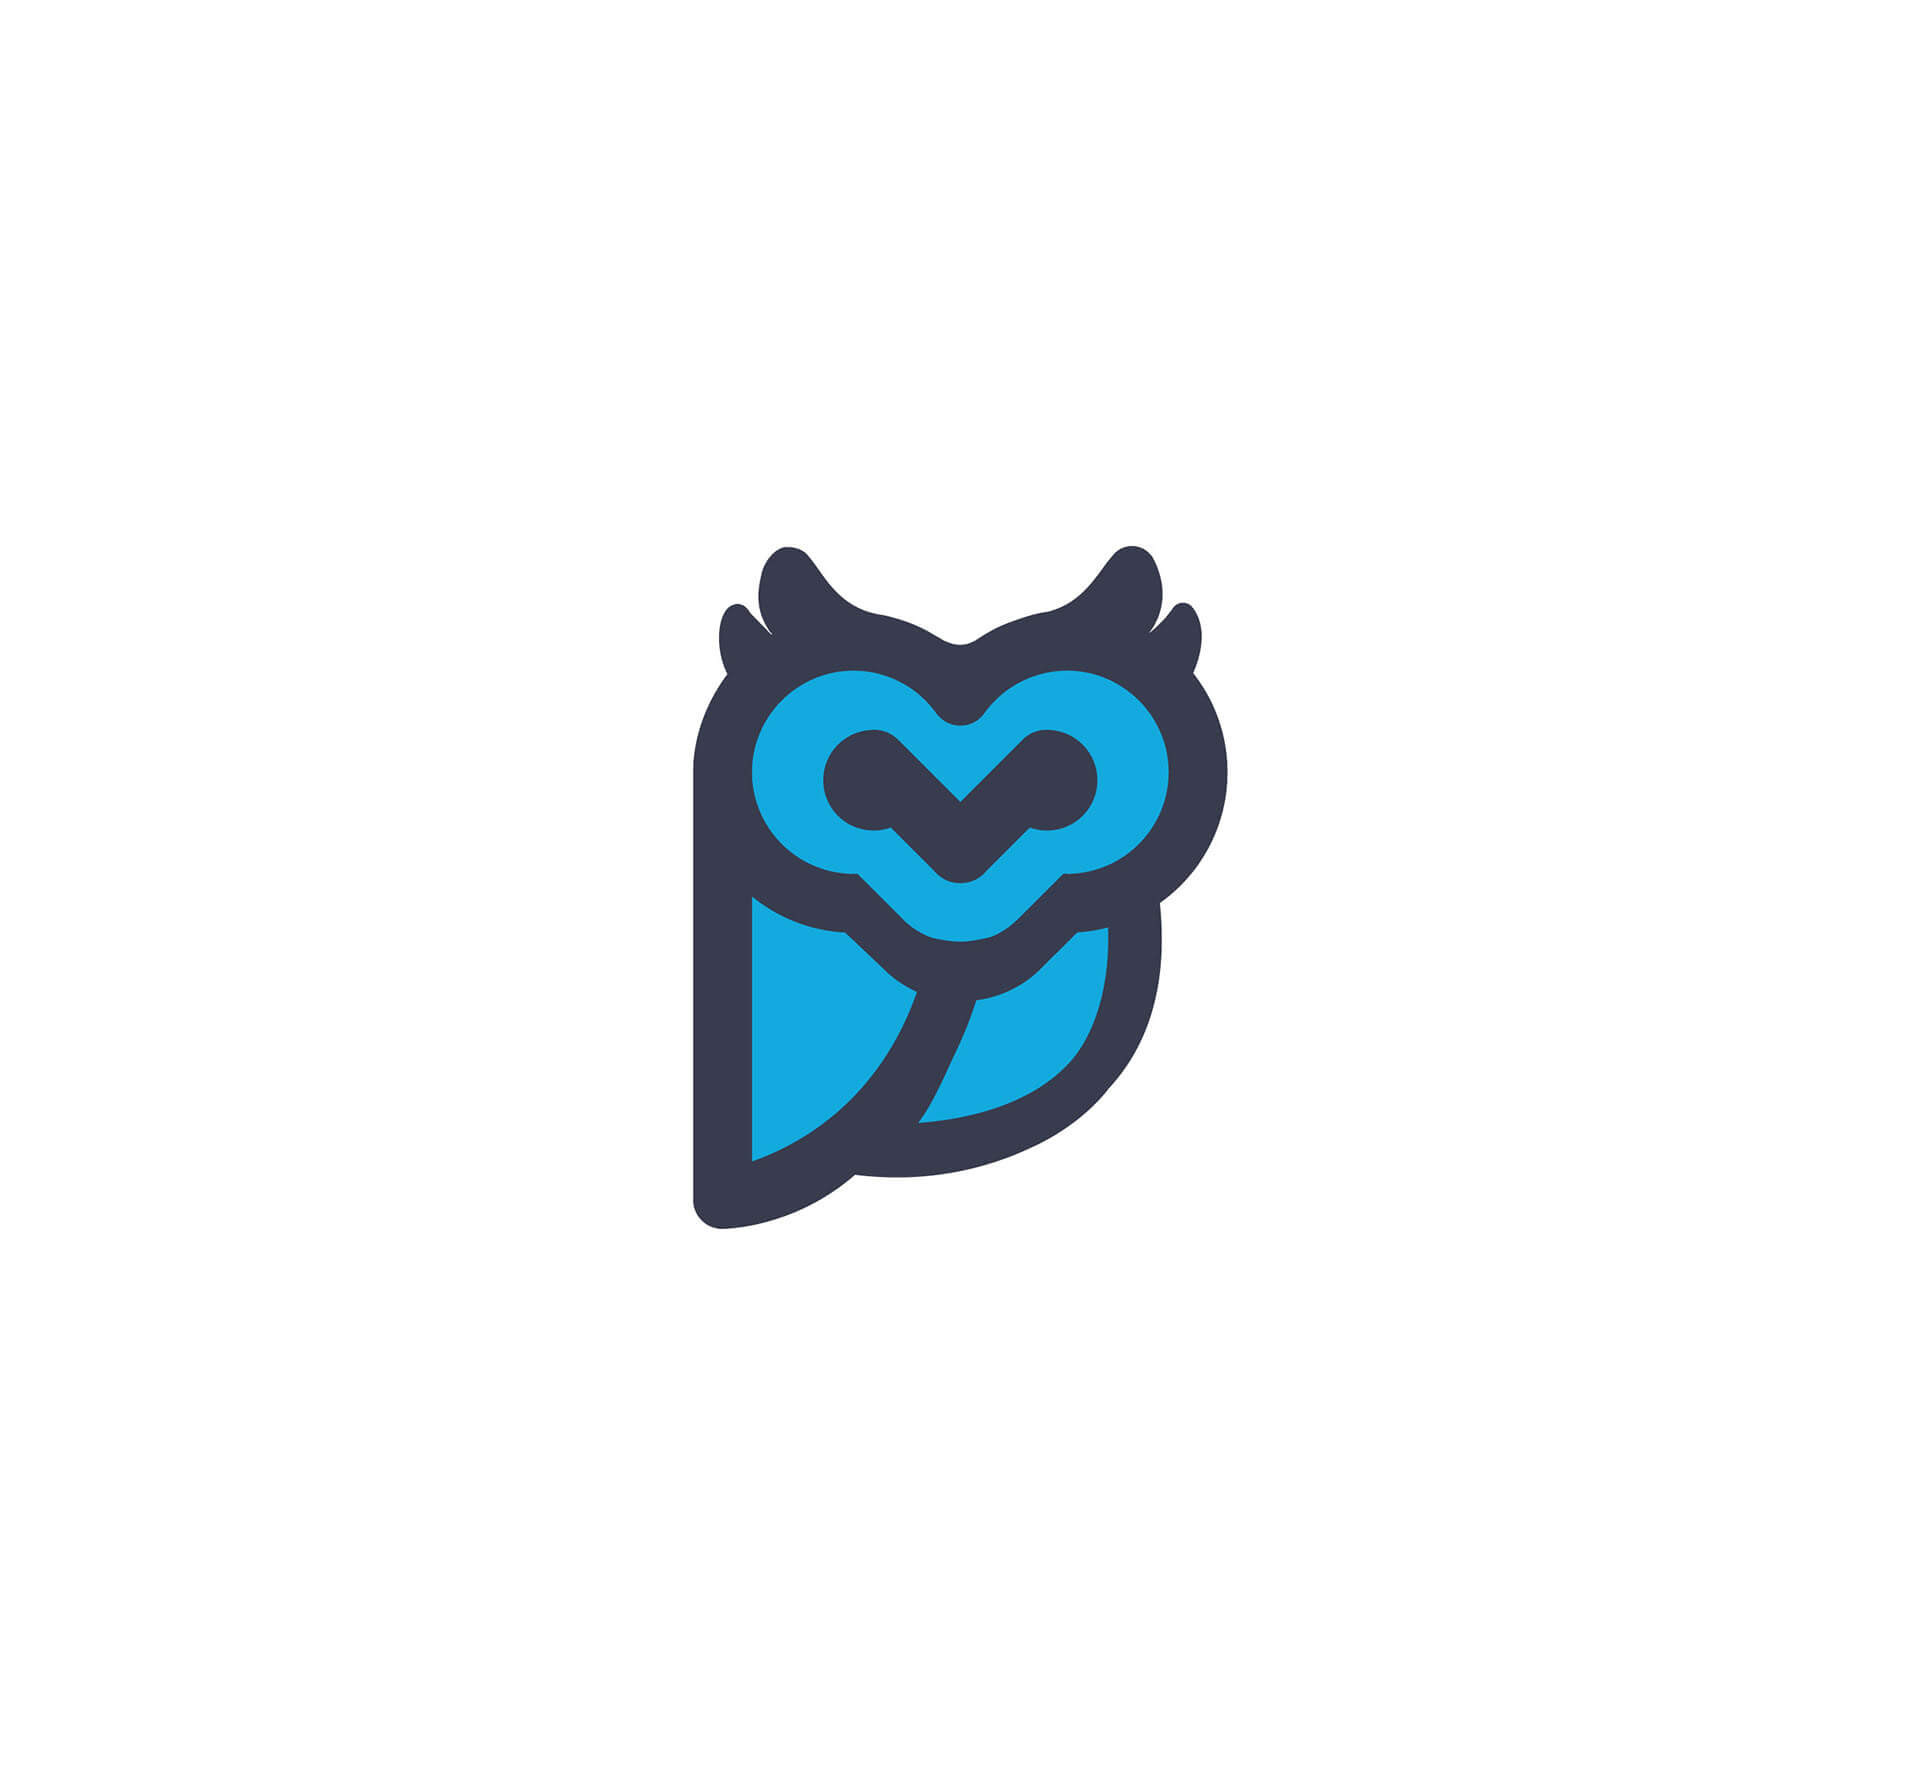 teamfluent-symbol